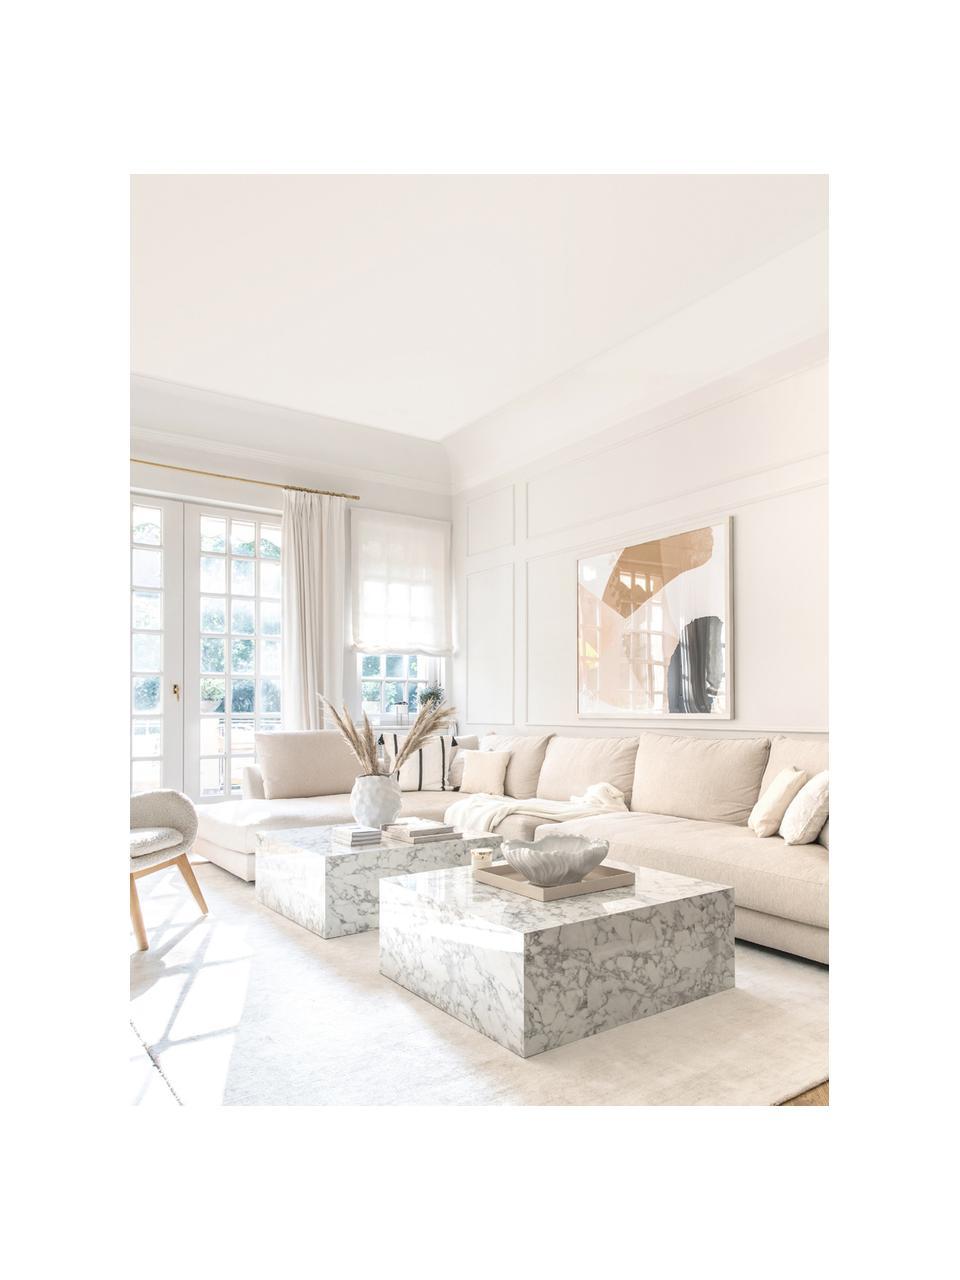 XL hoekbank Tribeca in beige, Bekleding: polyester, Frame: massief grenenhout, Poten: massief gelakt beukenhout, Geweven stof beige, B 405 x D 228 cm